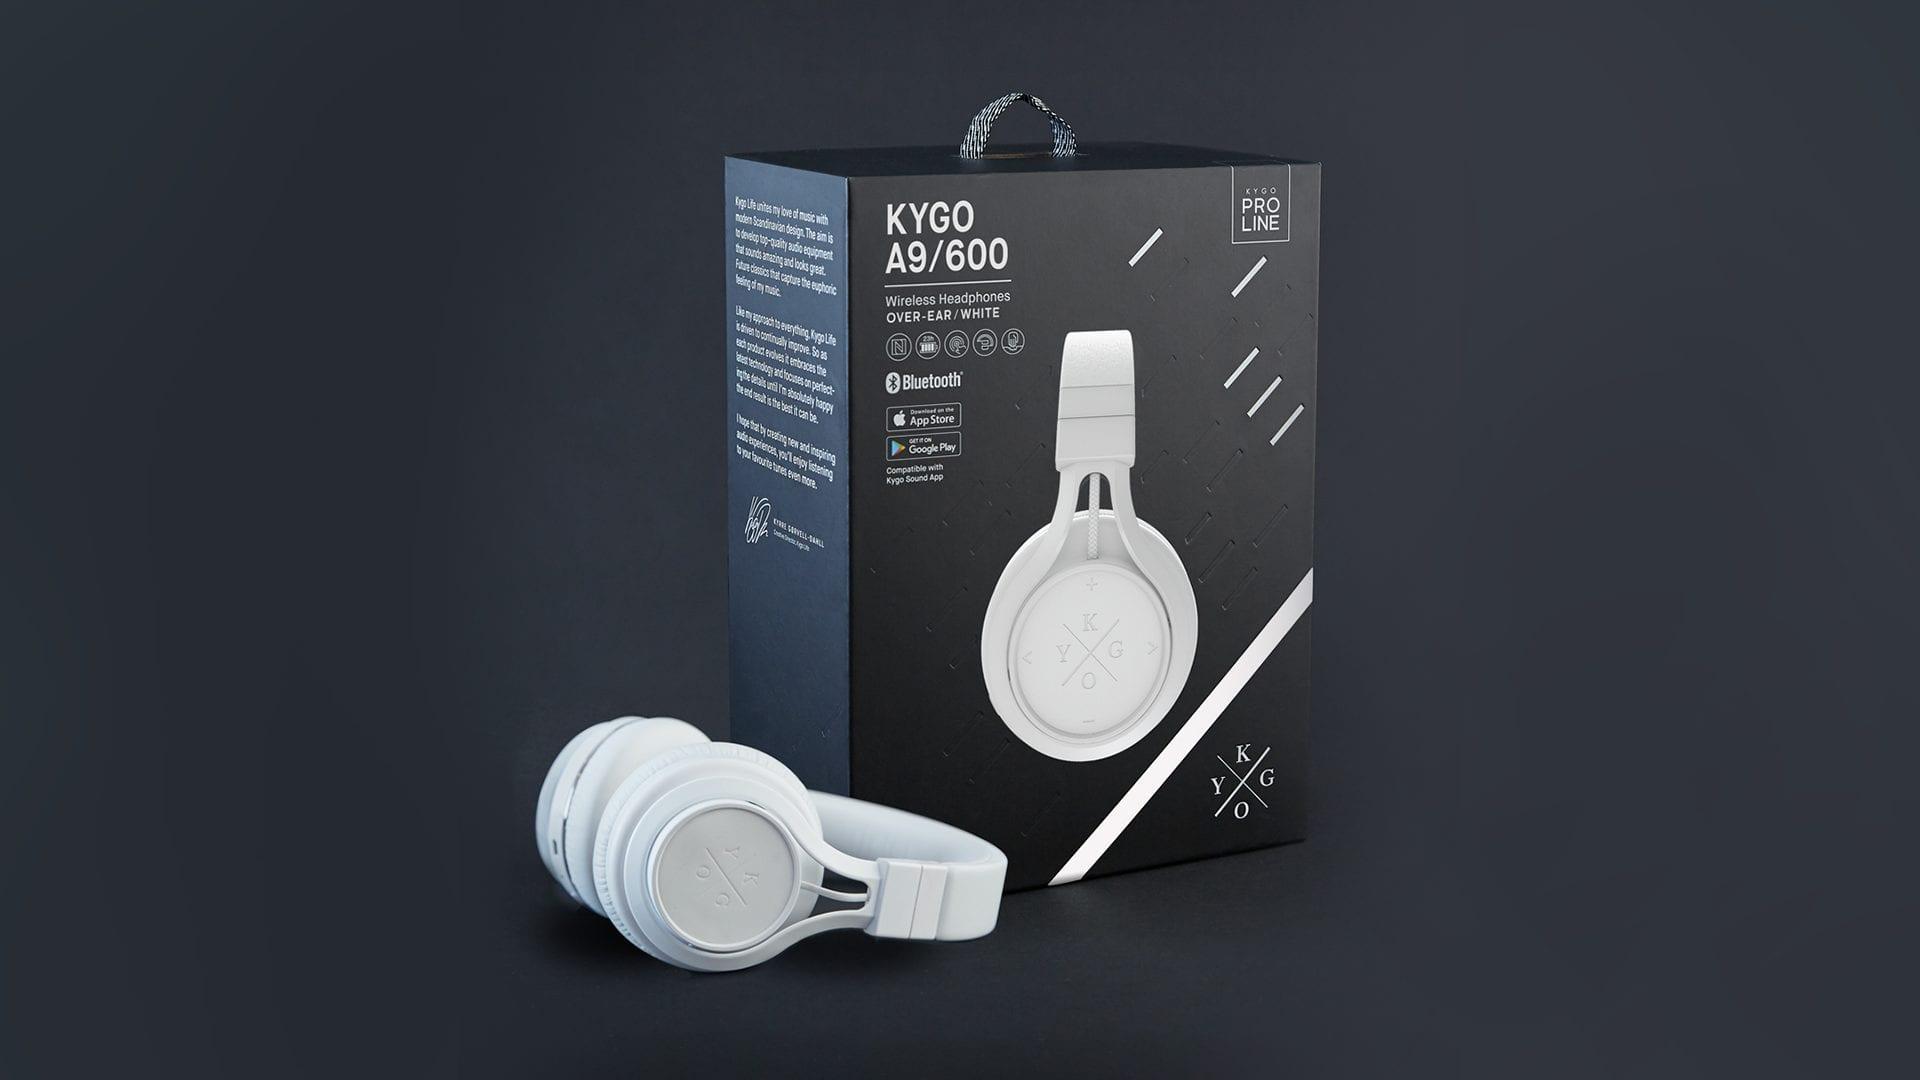 kygo_lifestyle_image10.png